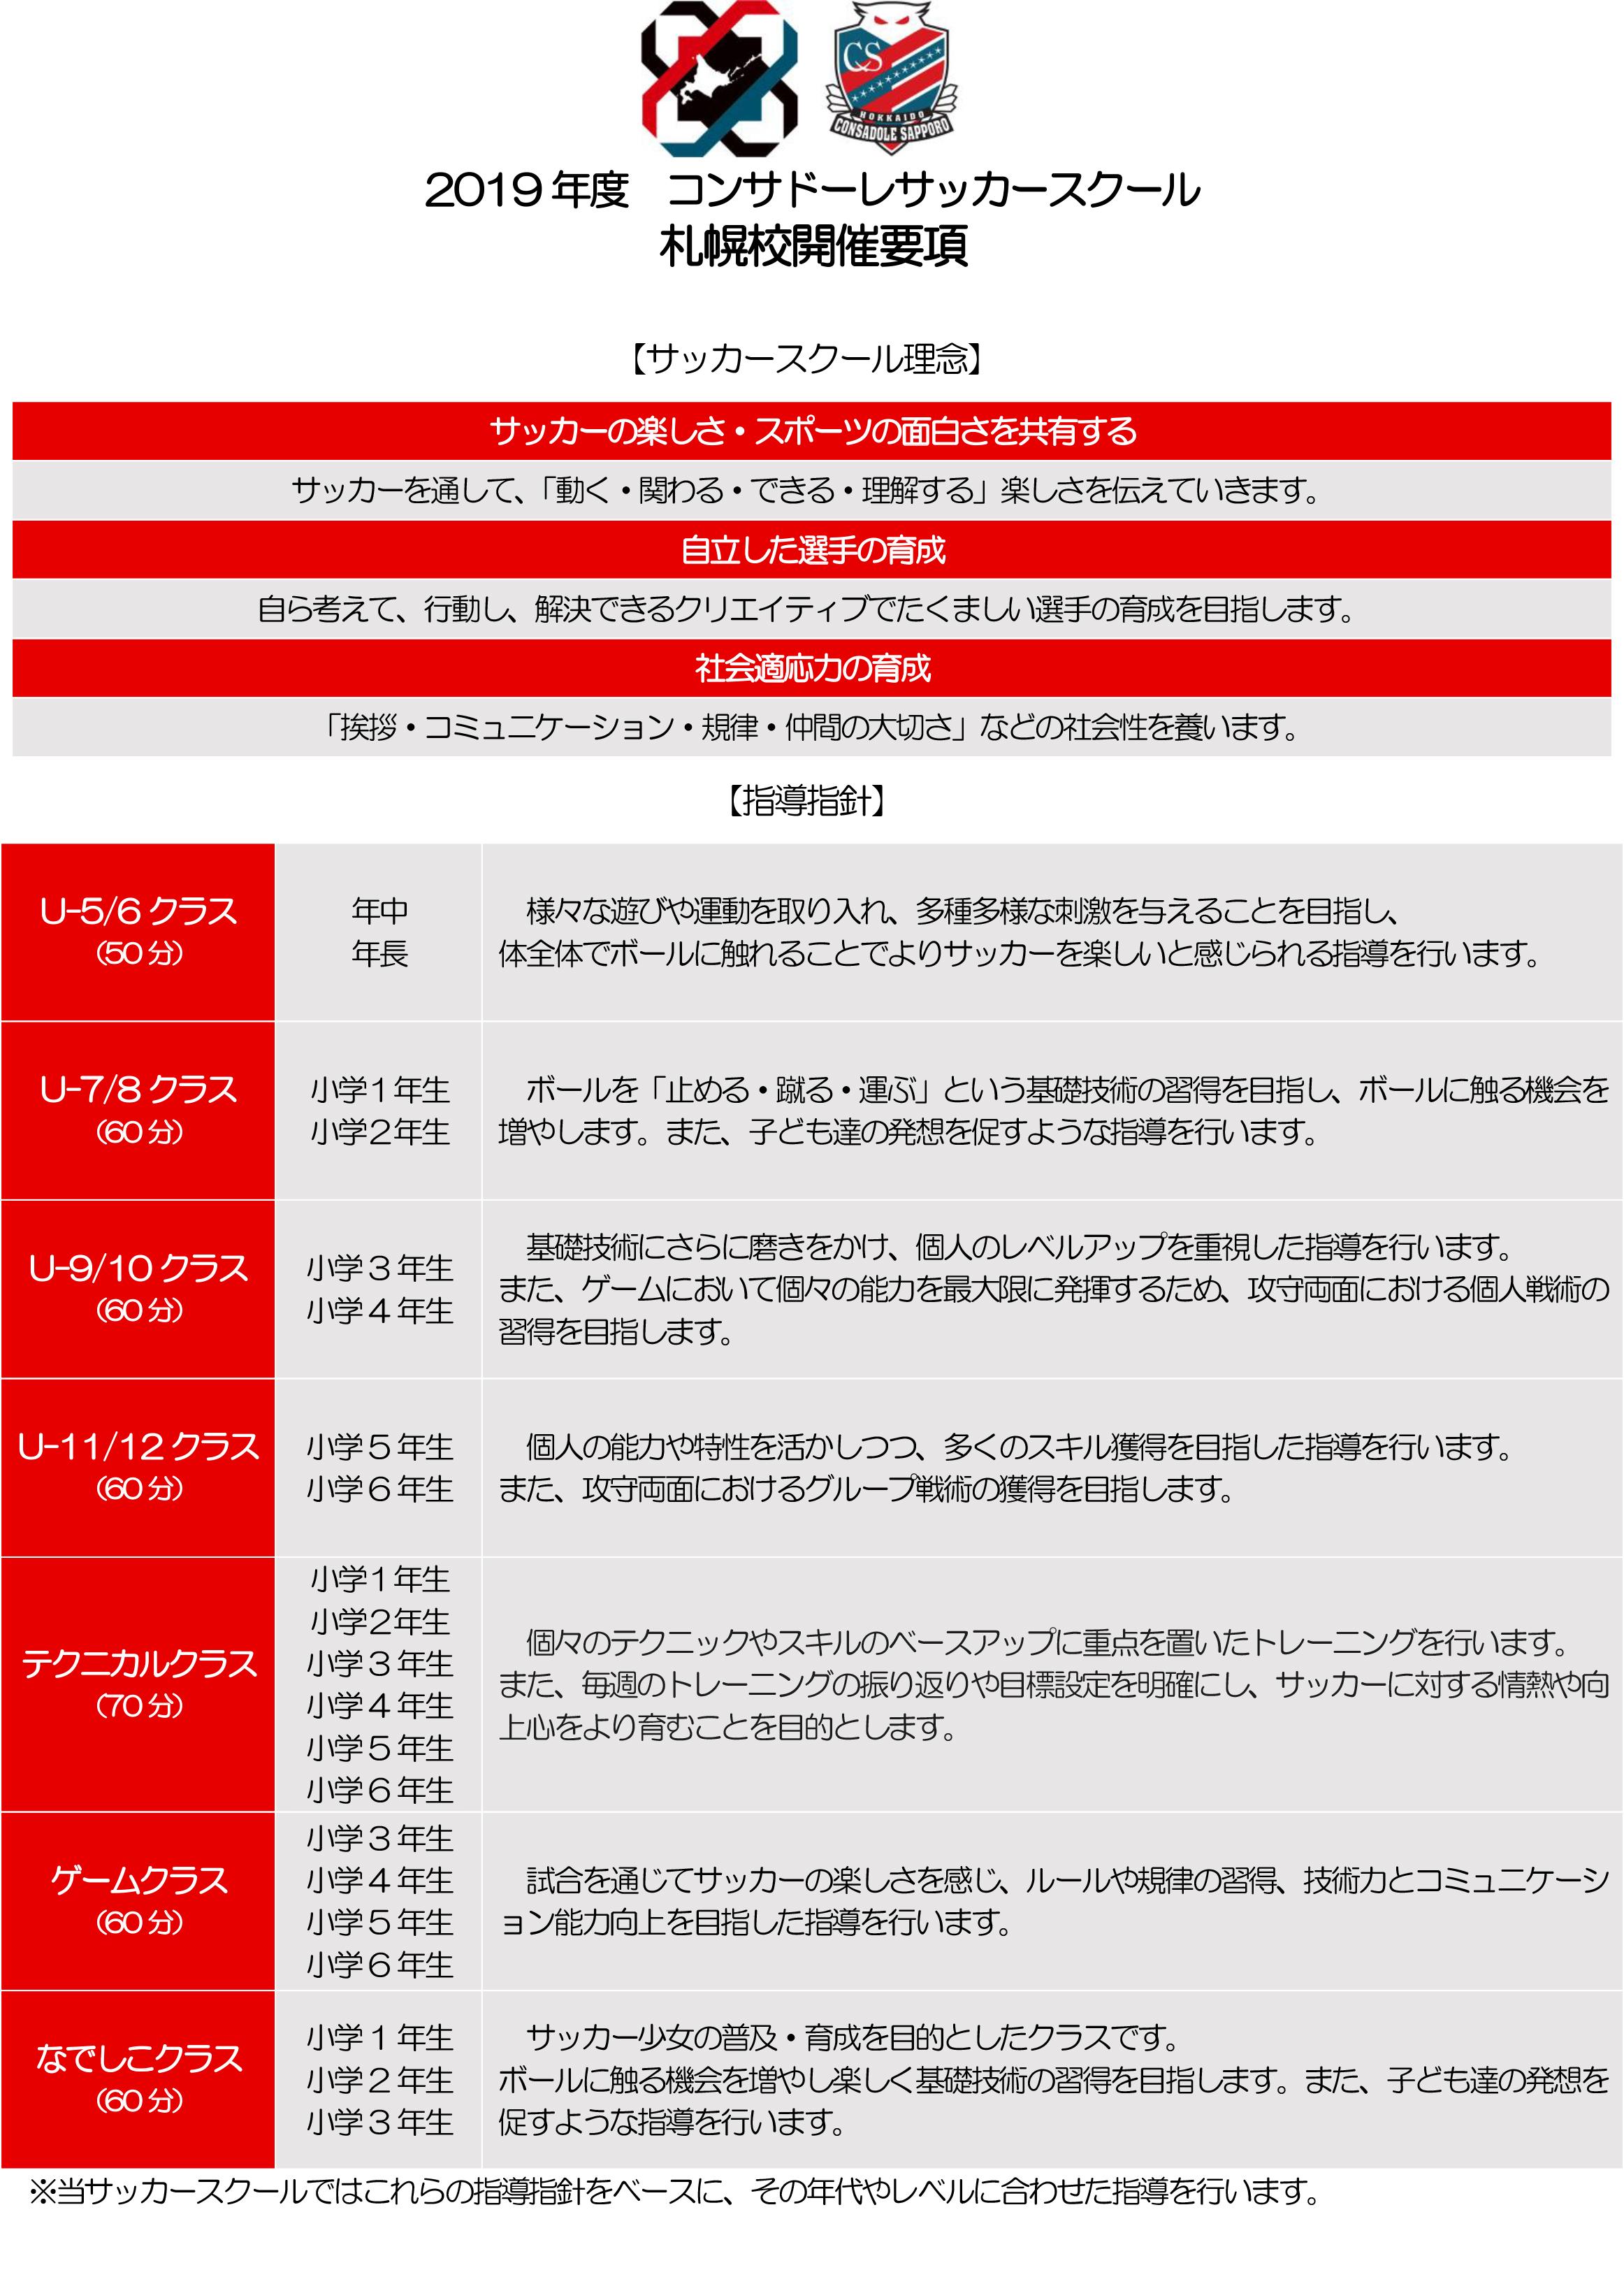 https://chsc.jp/news/up_images/19%E5%B9%B4%E5%BA%A6----%E6%9C%AD%E5%B9%8C%E6%A0%A1%E9%96%8B%E5%82%AC%E8%A6%81%E9%A0%85-1.jpg